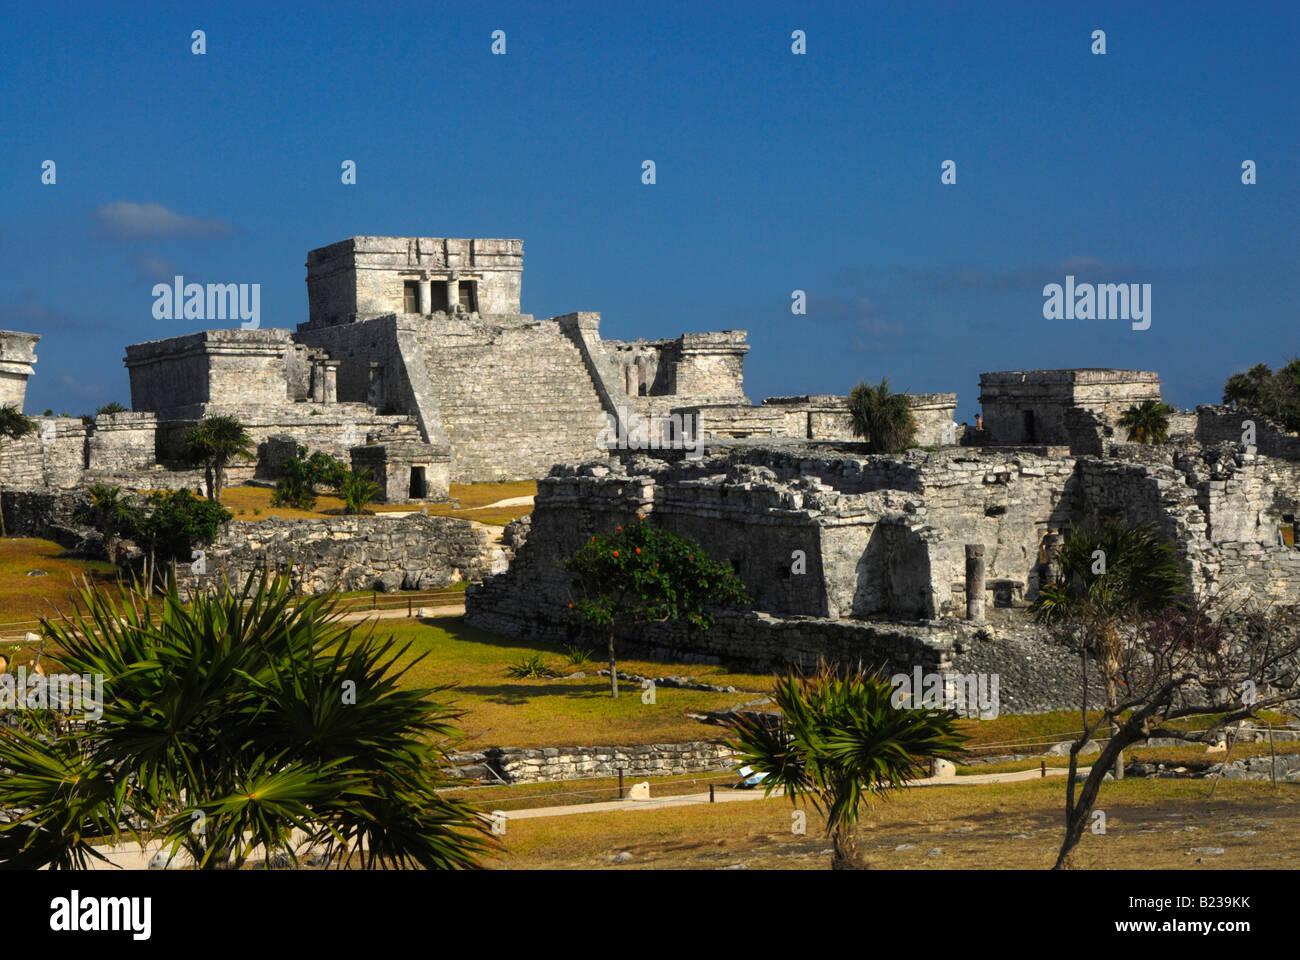 Tulum Mayan Ruins, Mexico - Stock Image